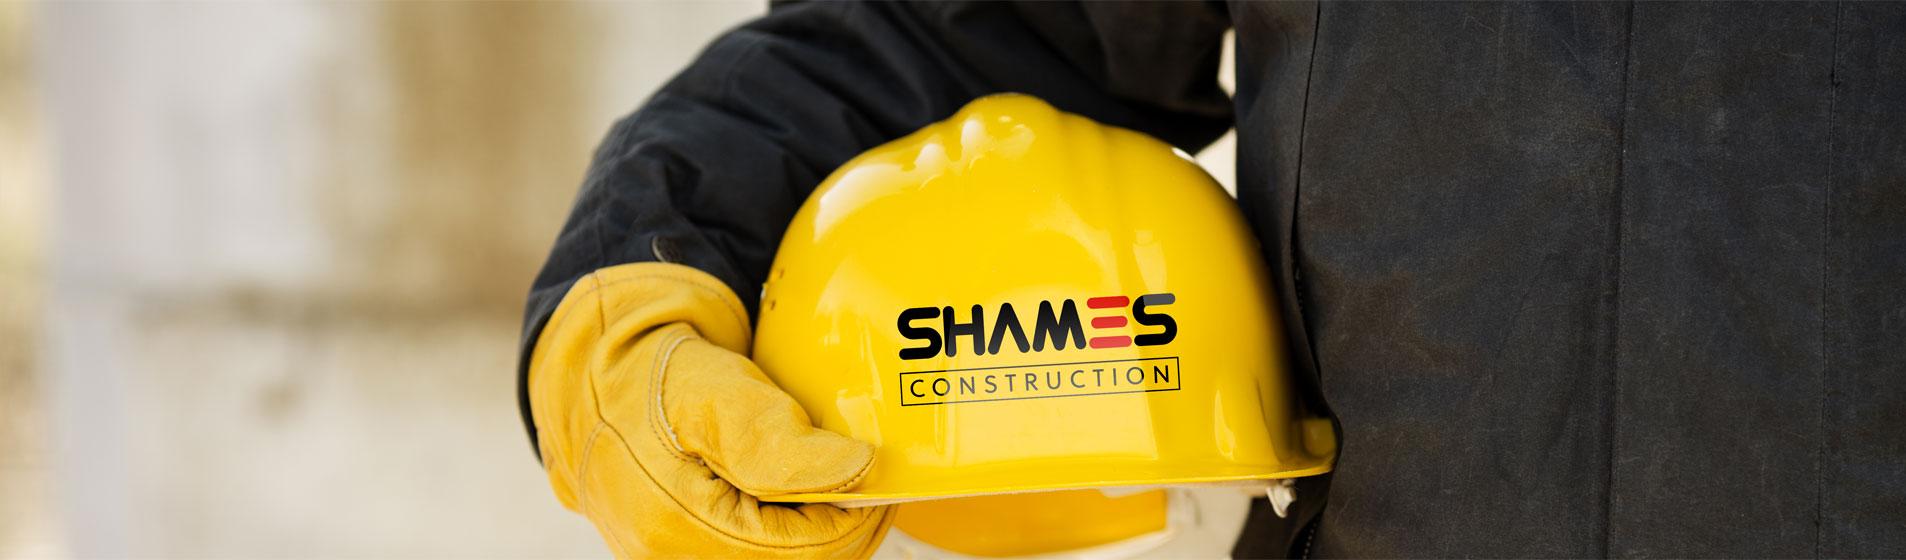 hardhat with shames construction logo